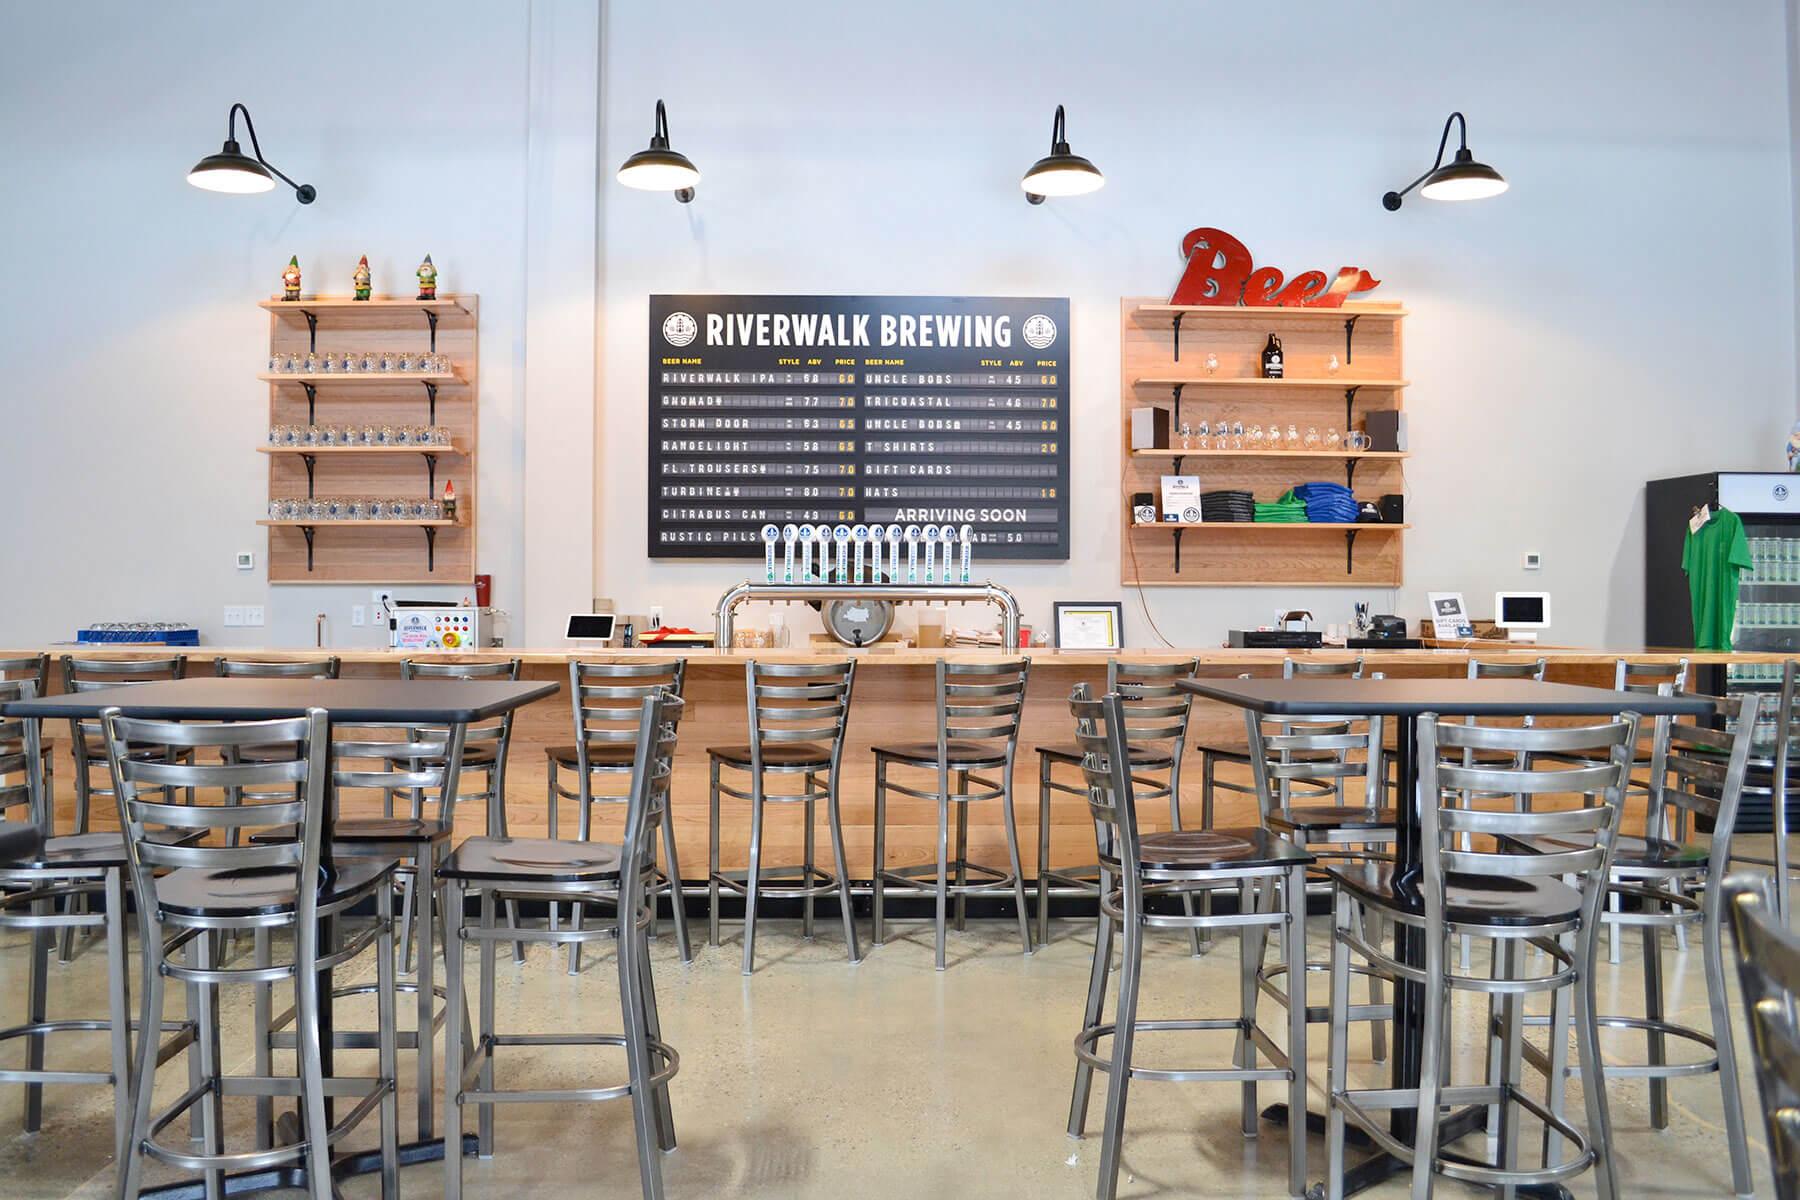 Inside the taproom at Riverwalk Brewing Co. in Newburyport, Massachusetts